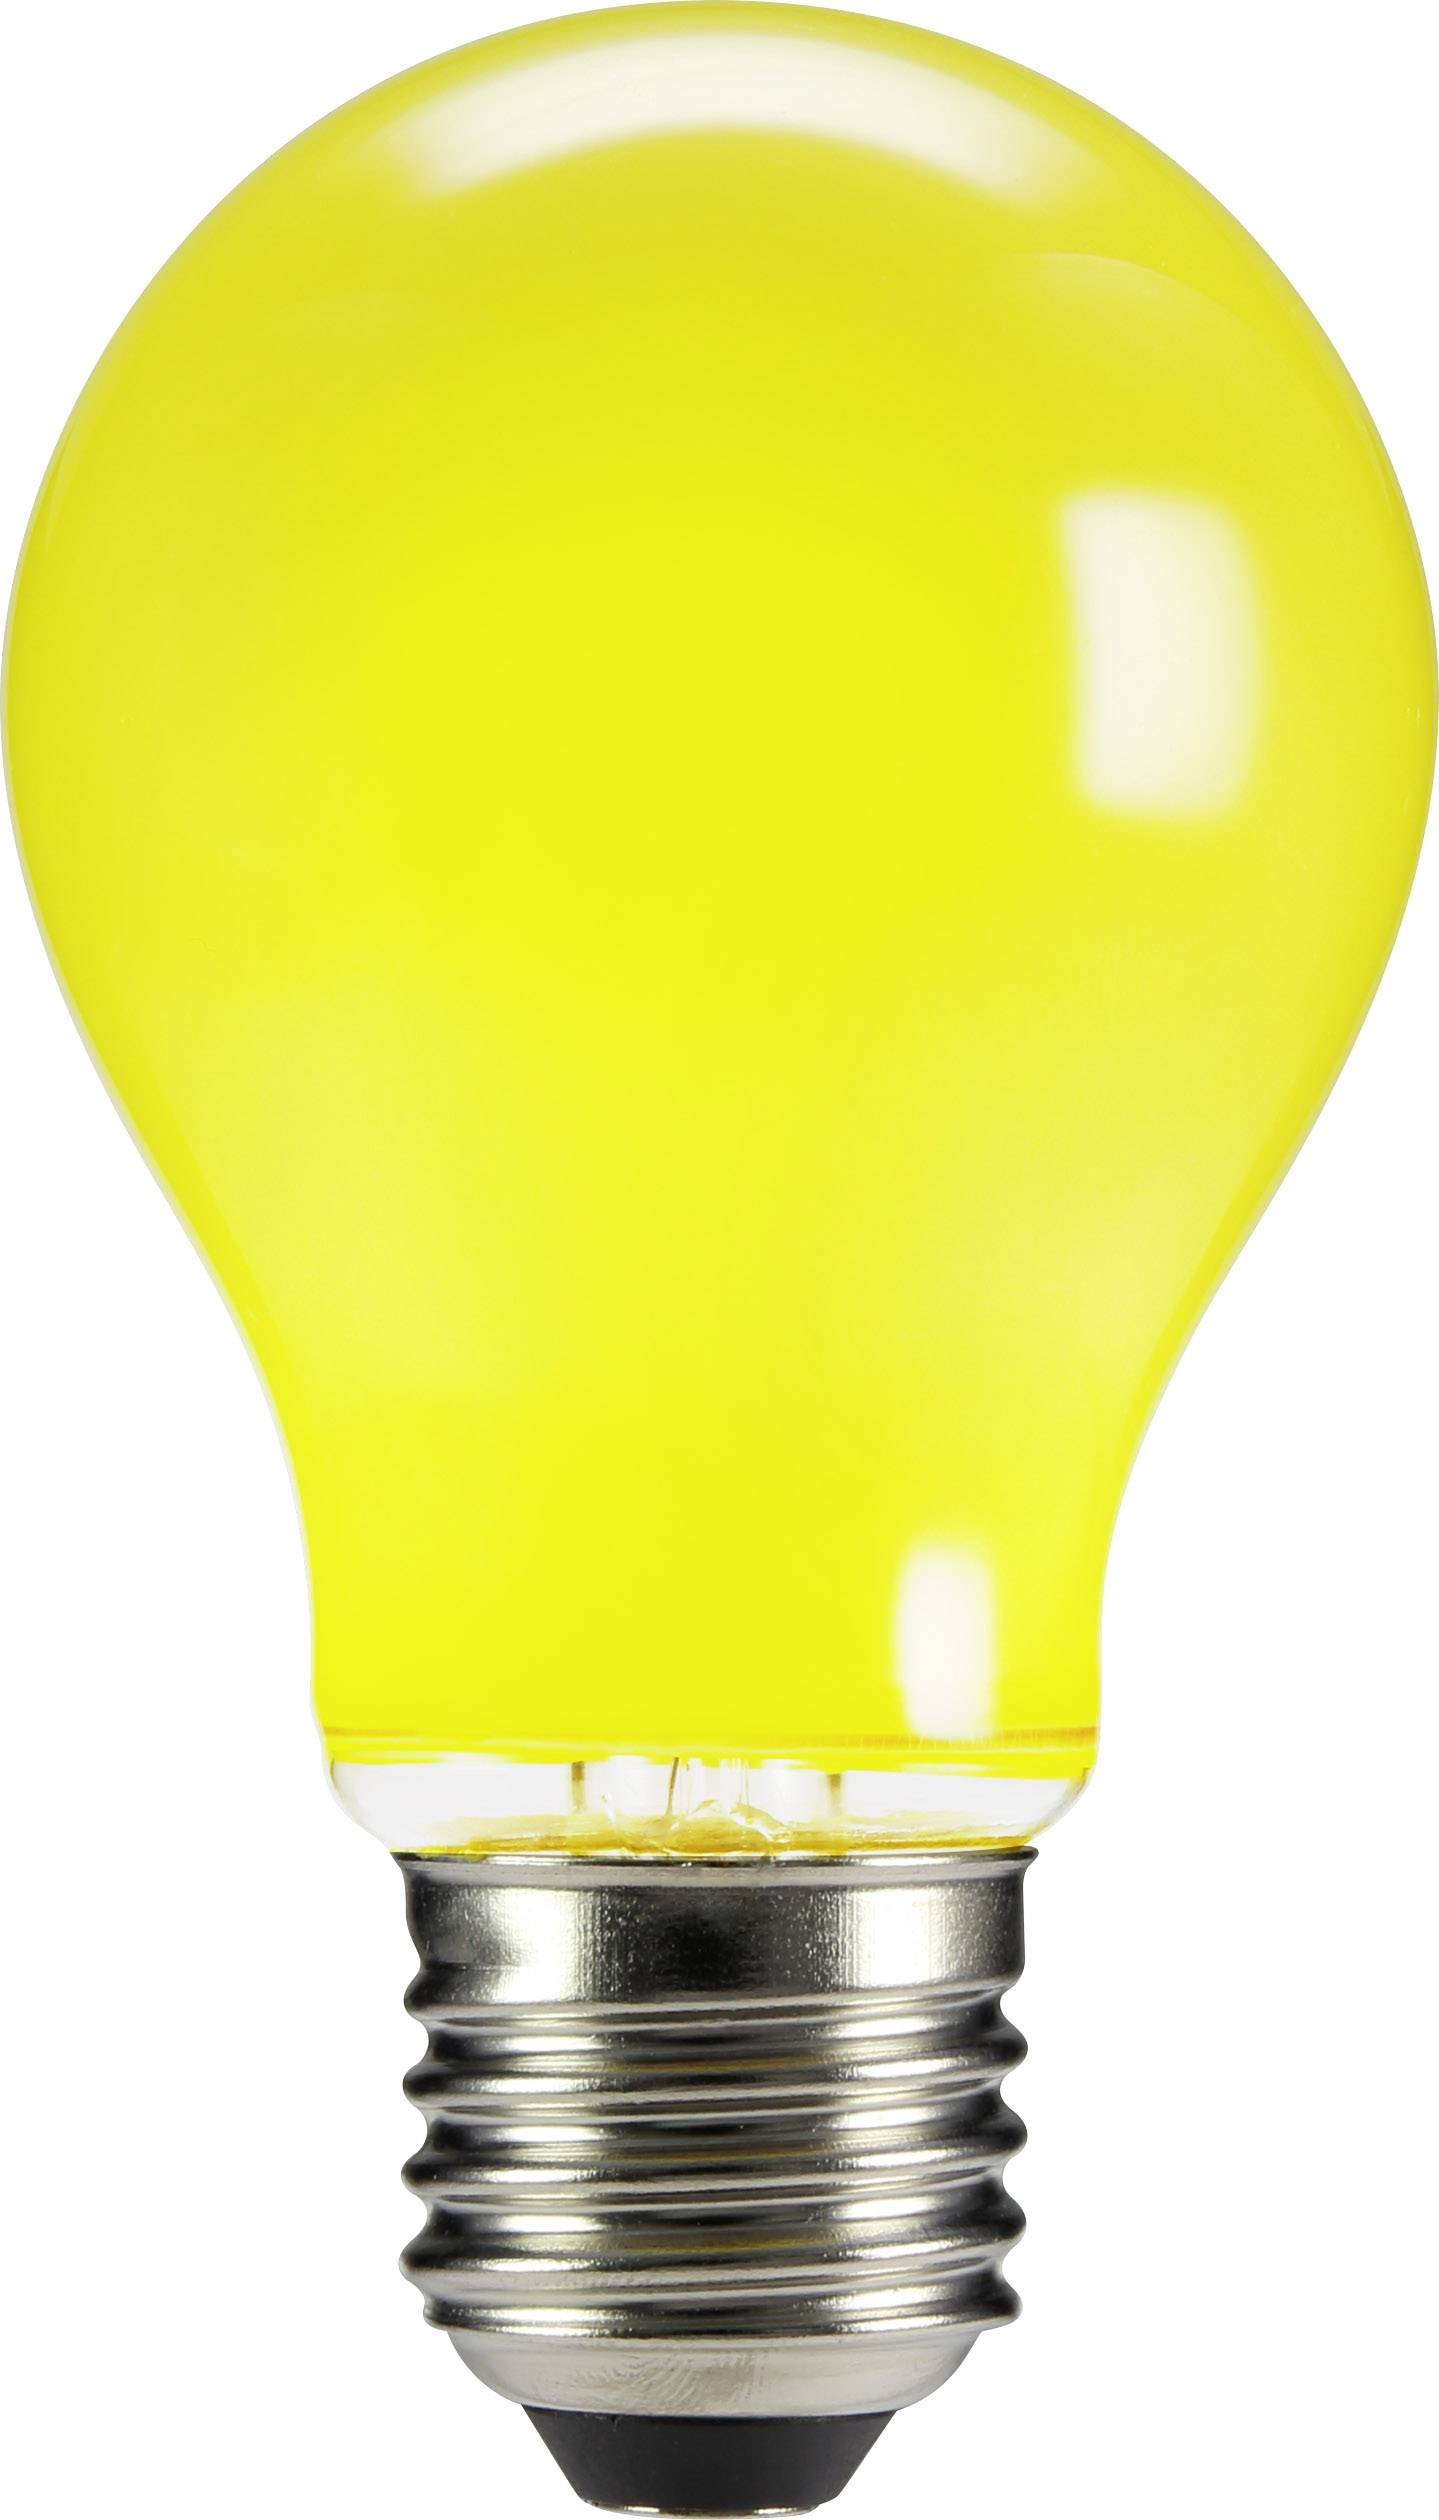 Calex Globe Light Bulbs